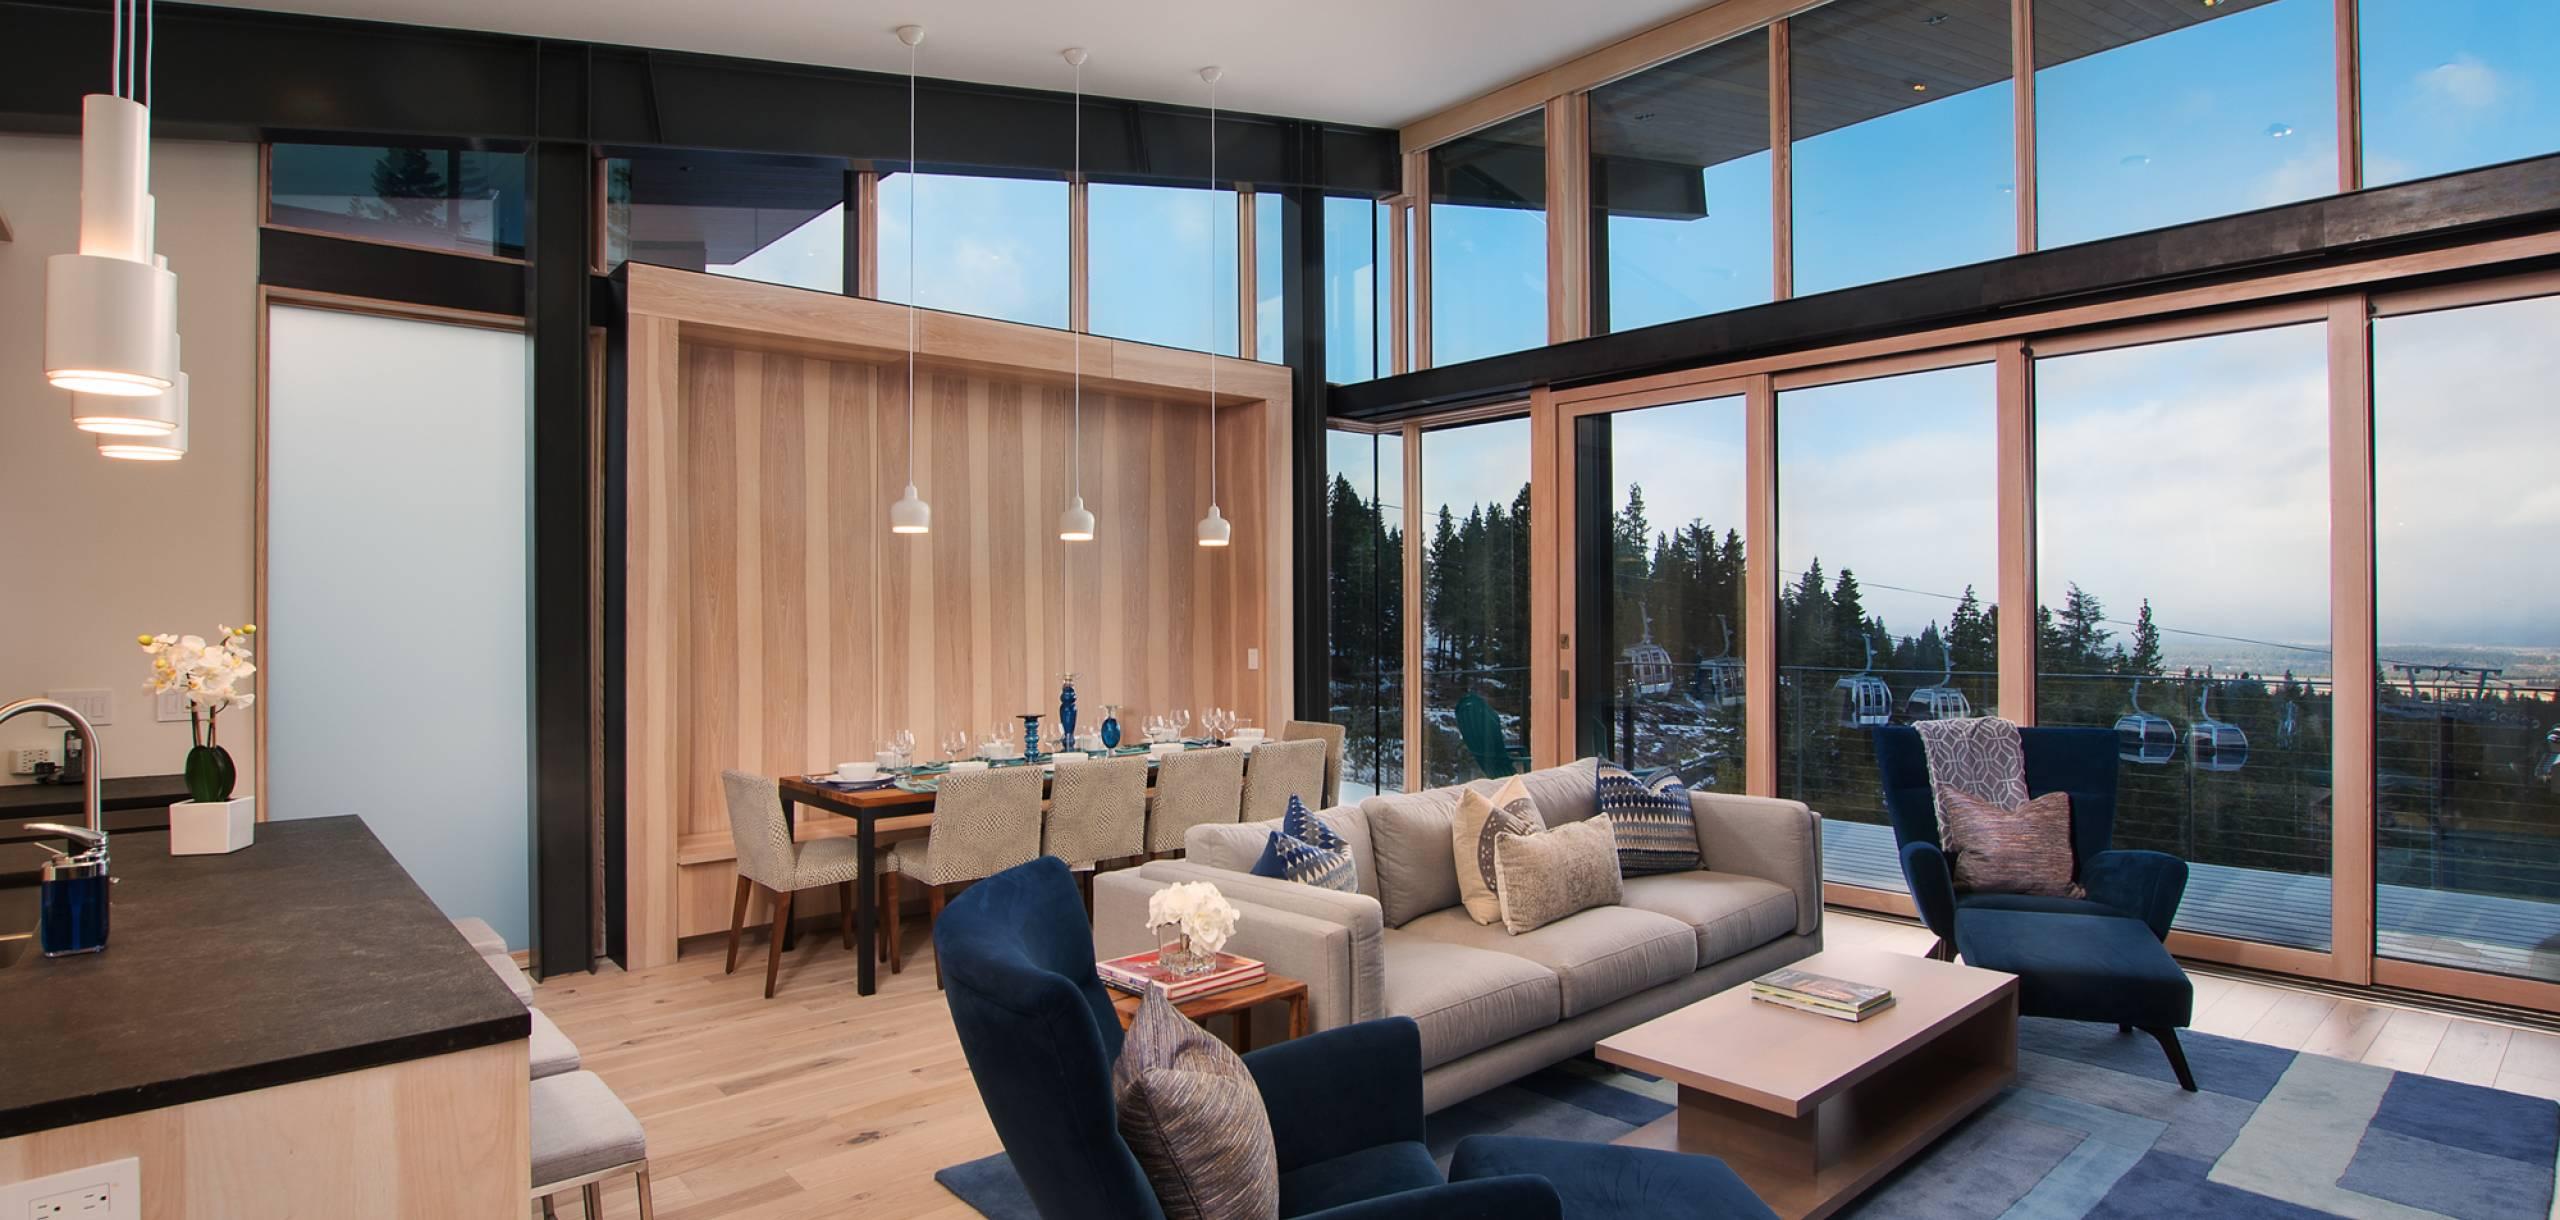 Tahoe Exclusive Vacation Rentals | North Lake Tahoe Luxury